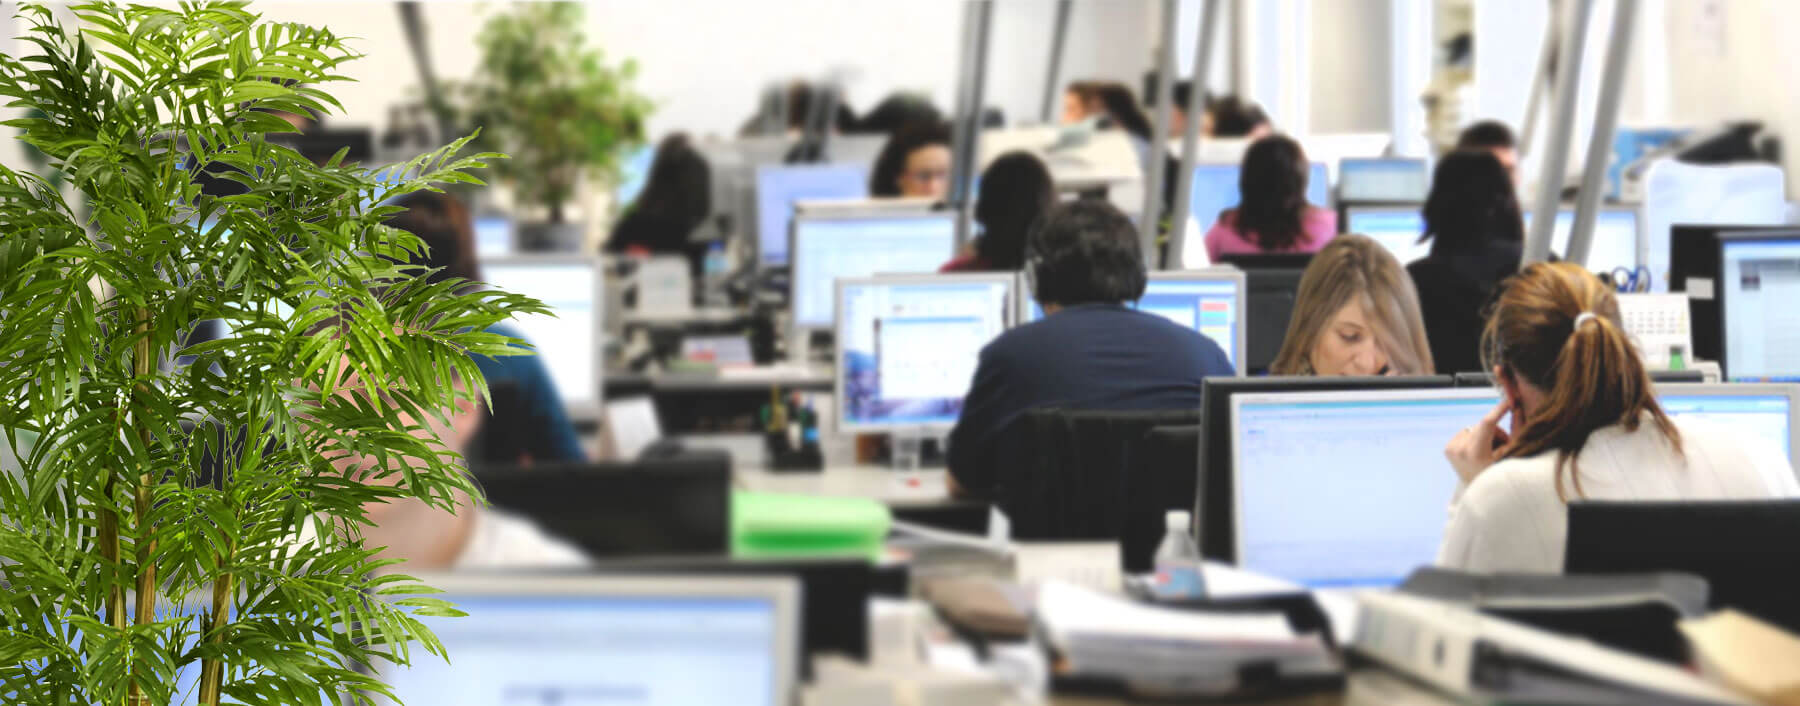 photo of helpdesk office